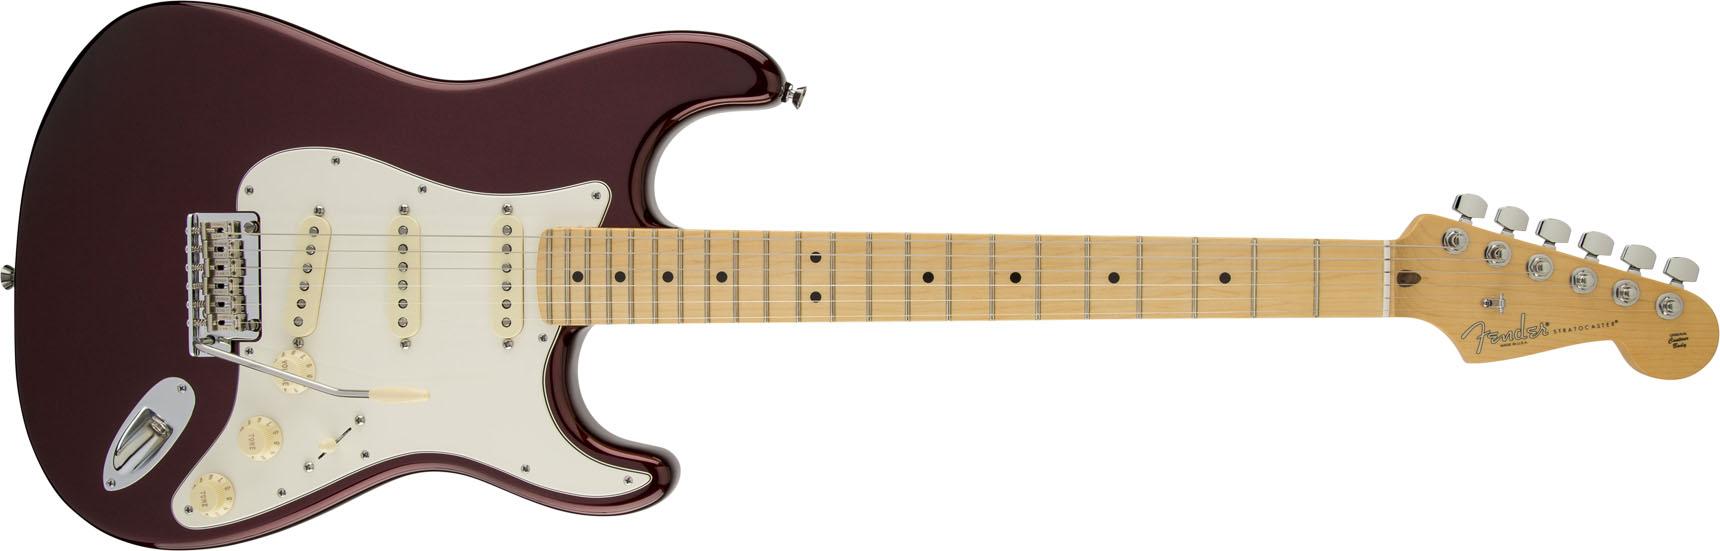 fender™电吉他/电贝司的问世令音乐家们得以